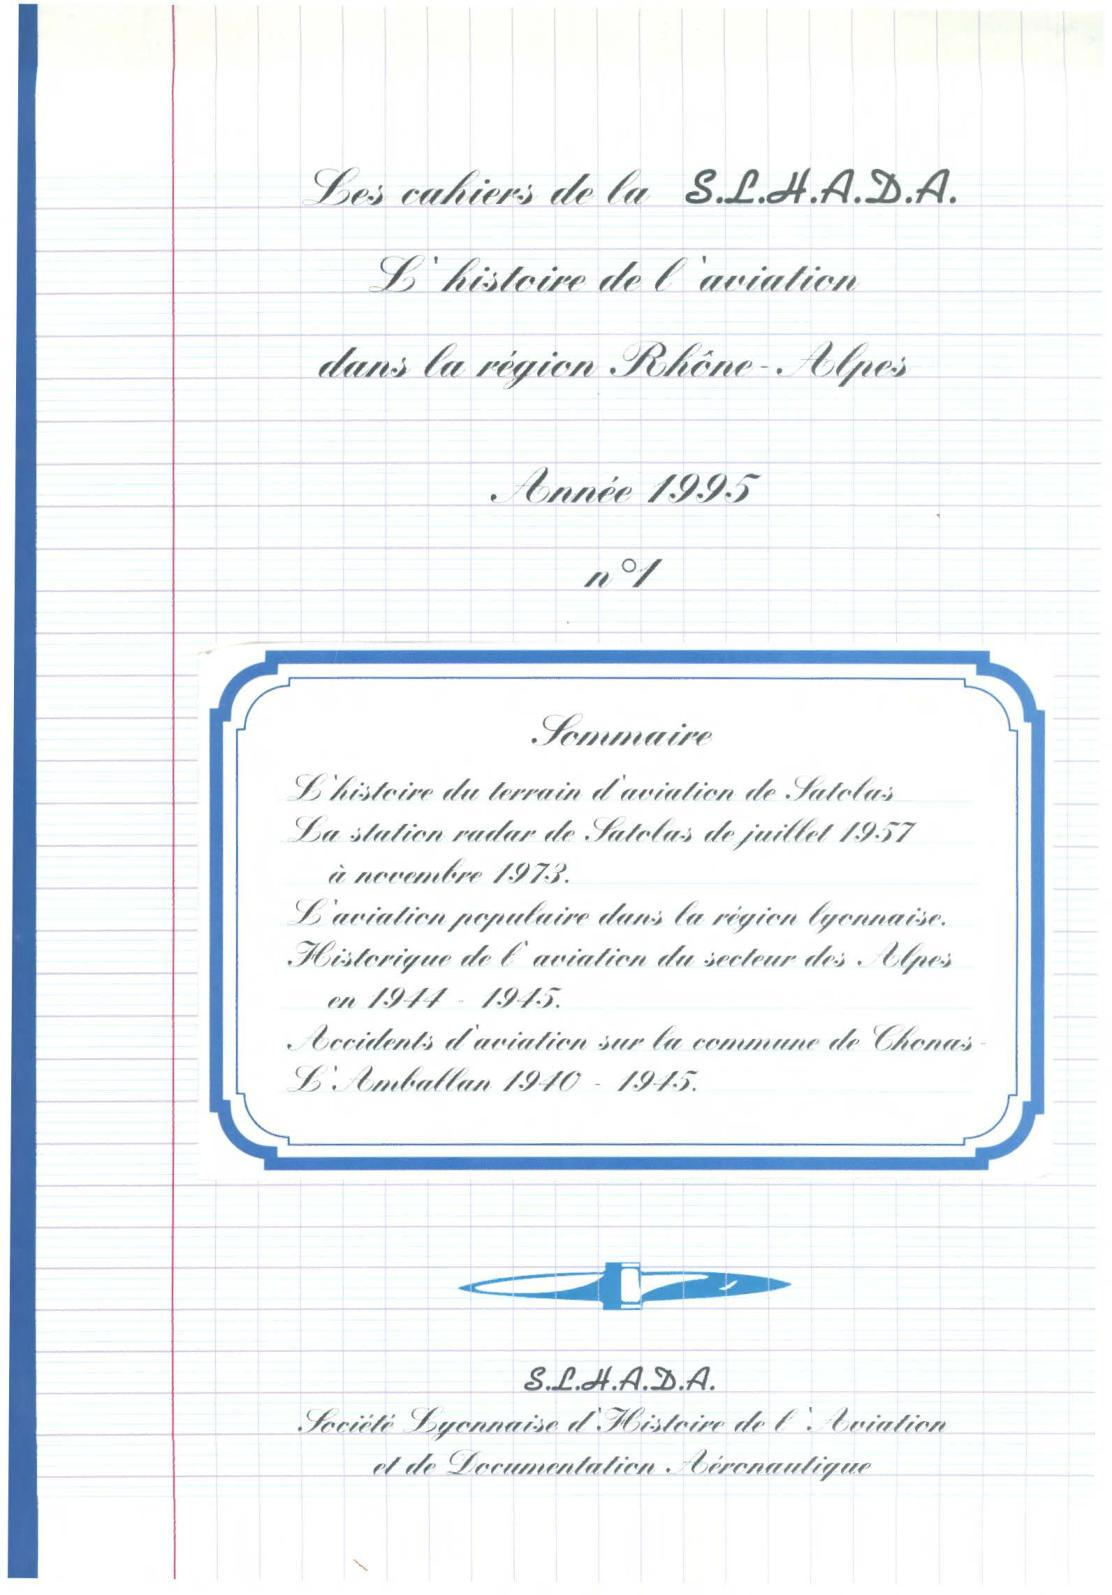 1995 Histoire De L'aviation En Rhône Alpes, Cahiers De La SLHADA